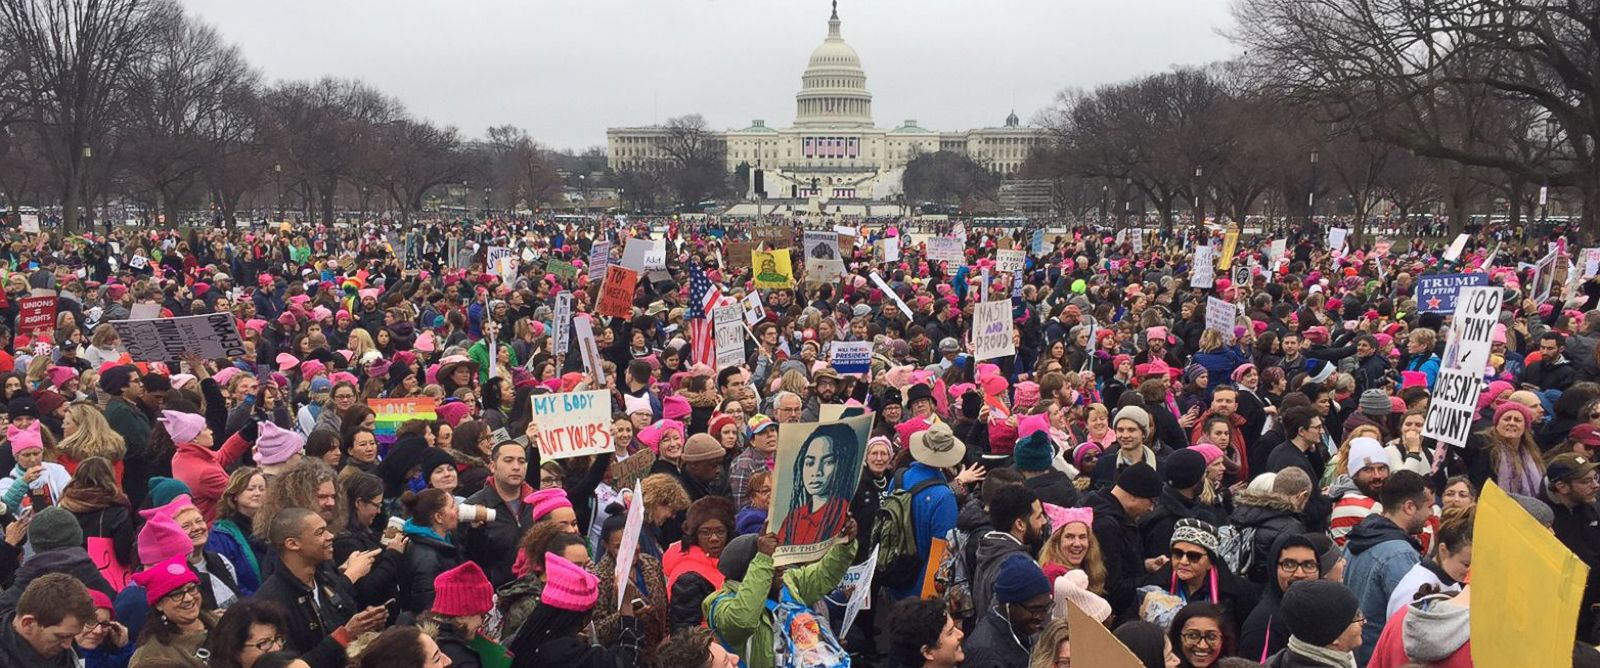 http://a.abcnews.com/images/Politics/GTY-womens-march-washington-4-jt-170121_12x5_1600.jpg